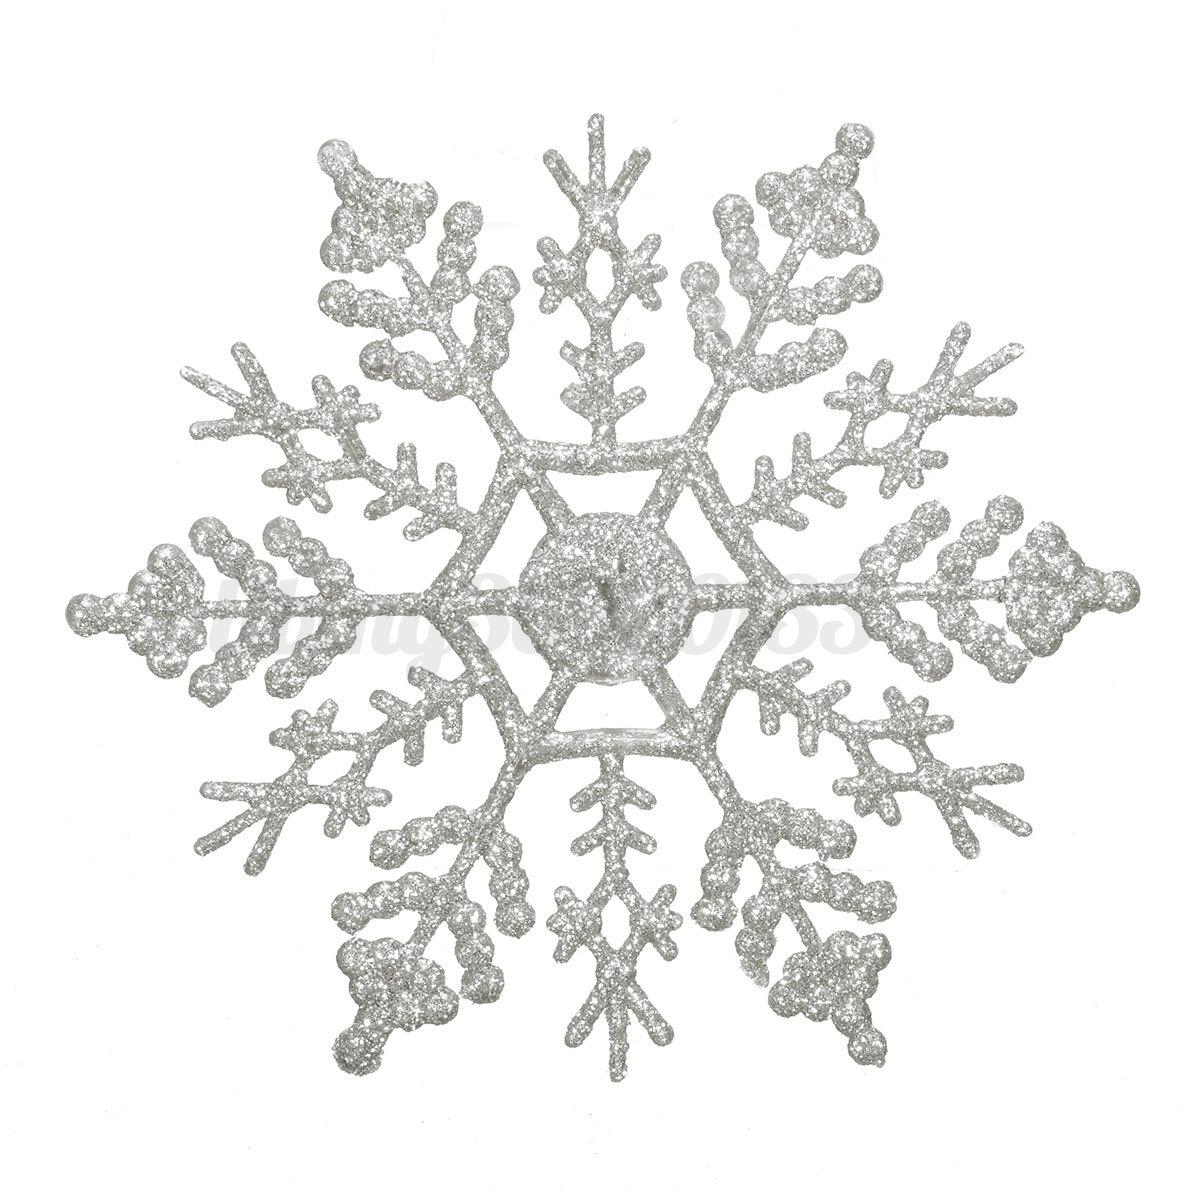 12x glitter schneeflocken snowflakes christbaumschmuck. Black Bedroom Furniture Sets. Home Design Ideas